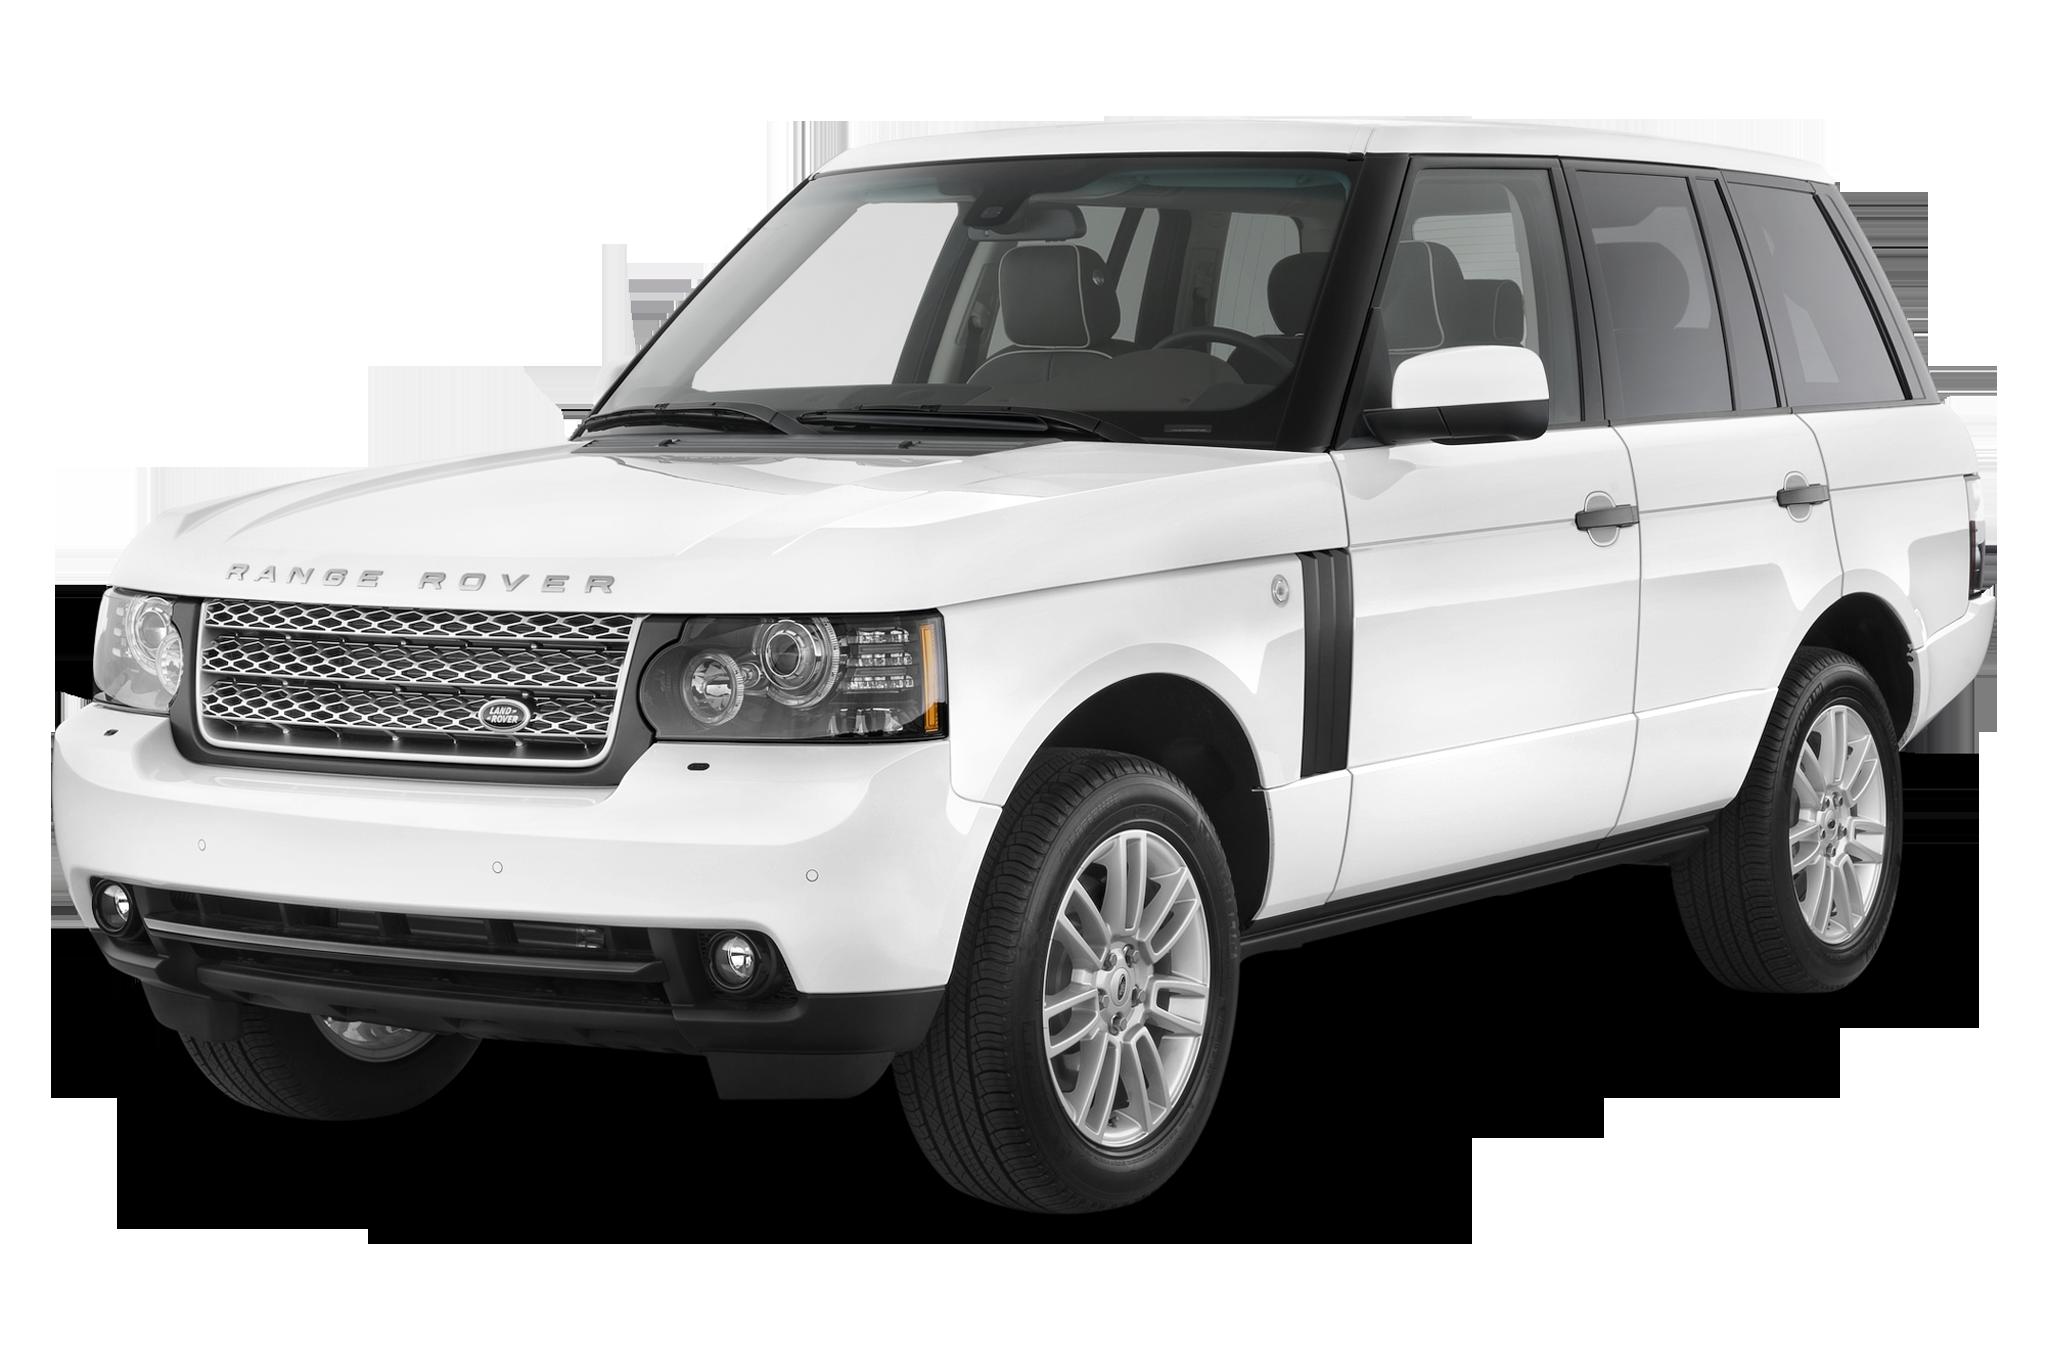 2010 Land Rover Range Rover Sport Land Rover Luxury Suv